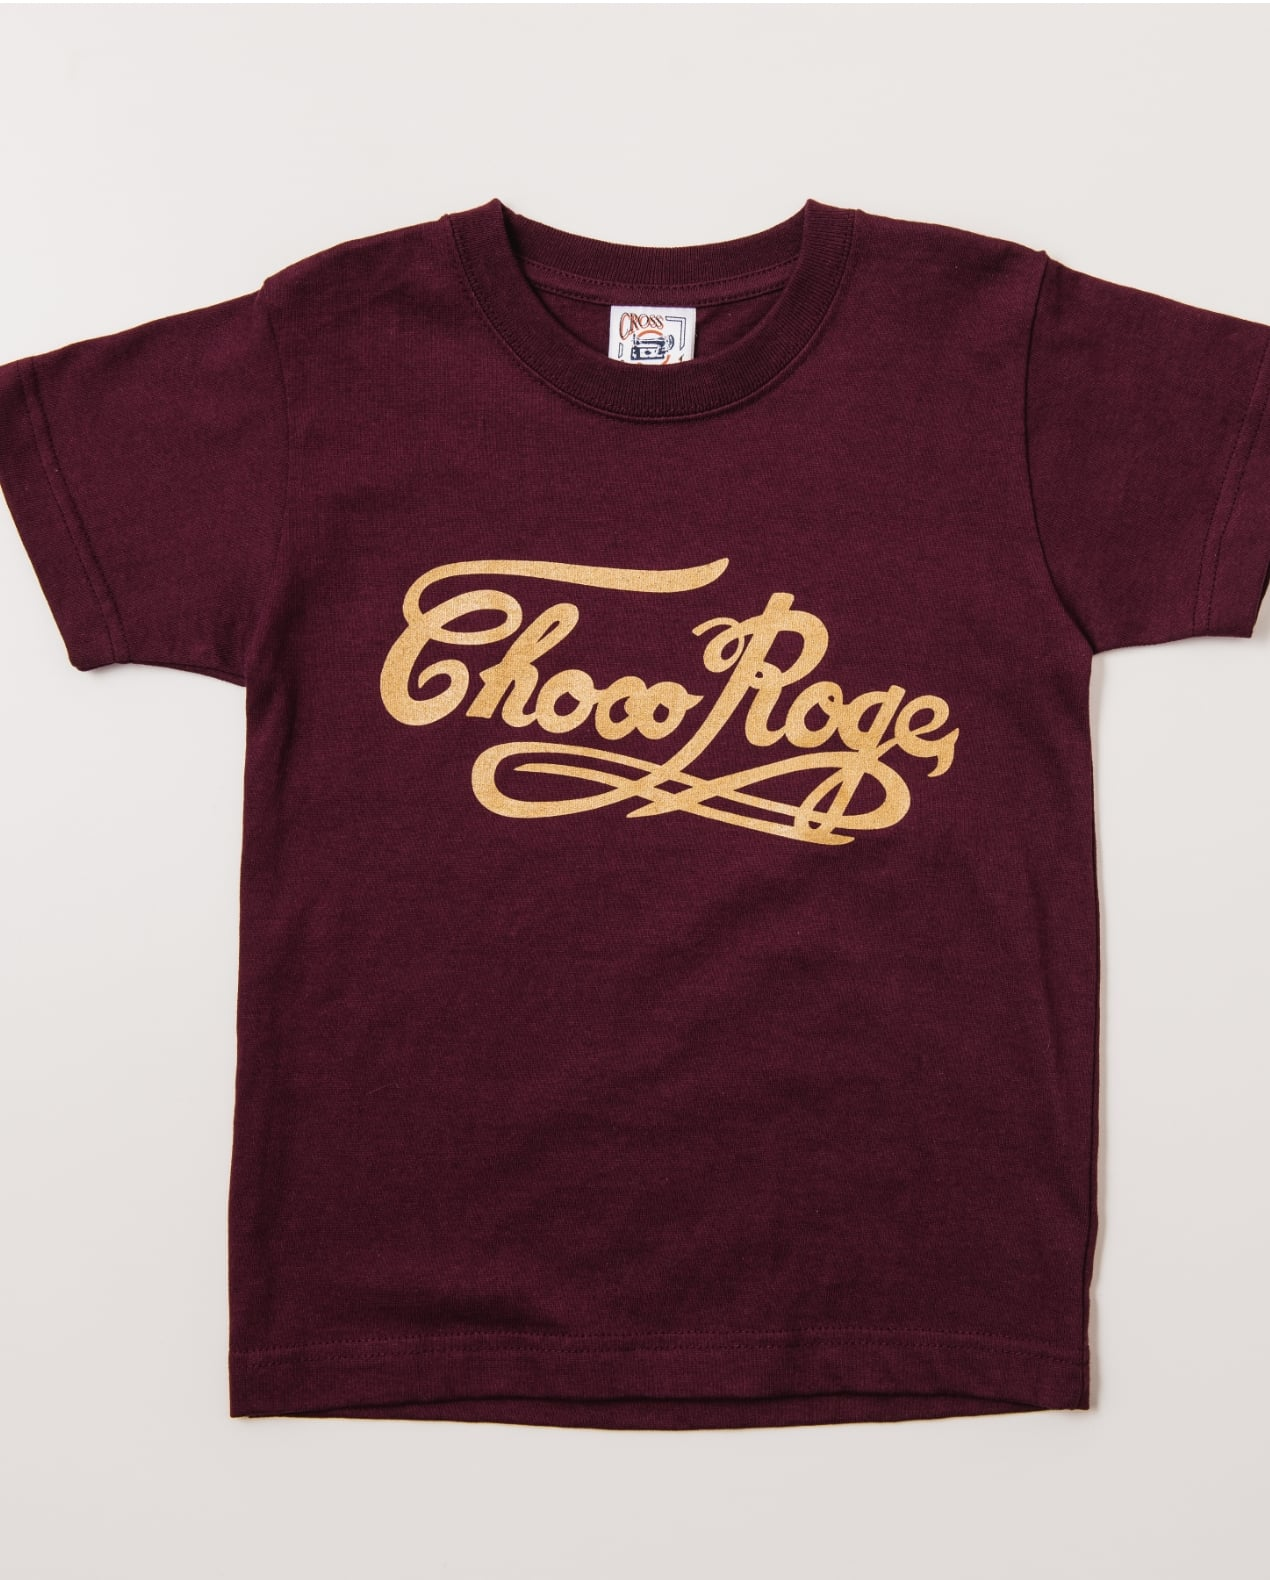 Tシャツ 子供用 茶色 サイズ140